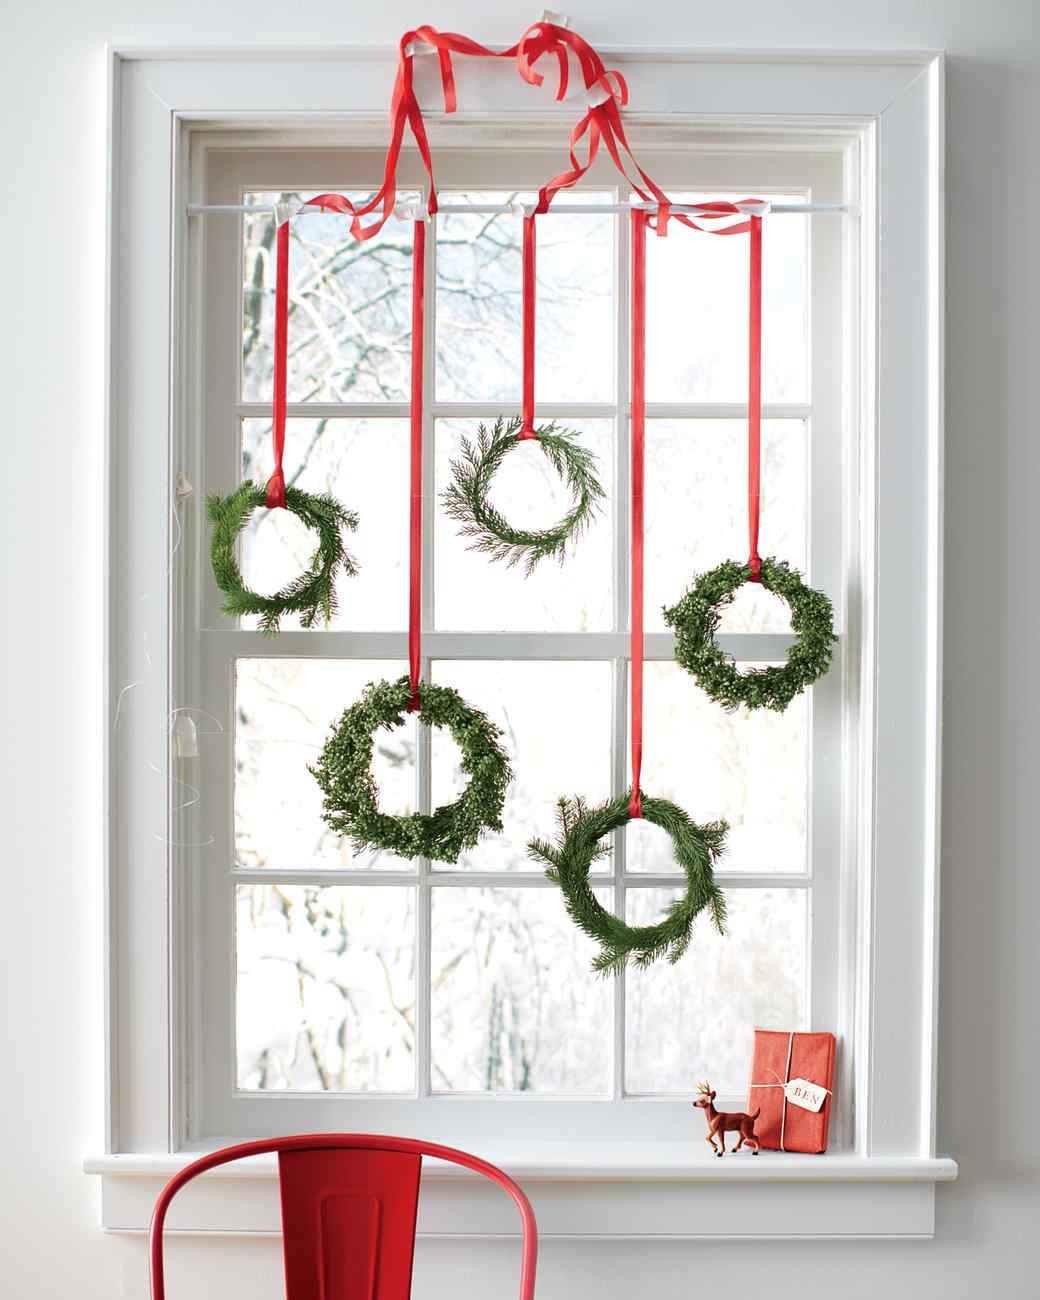 Our 10 Most Amazing Christmas Wreaths | Martha Stewart